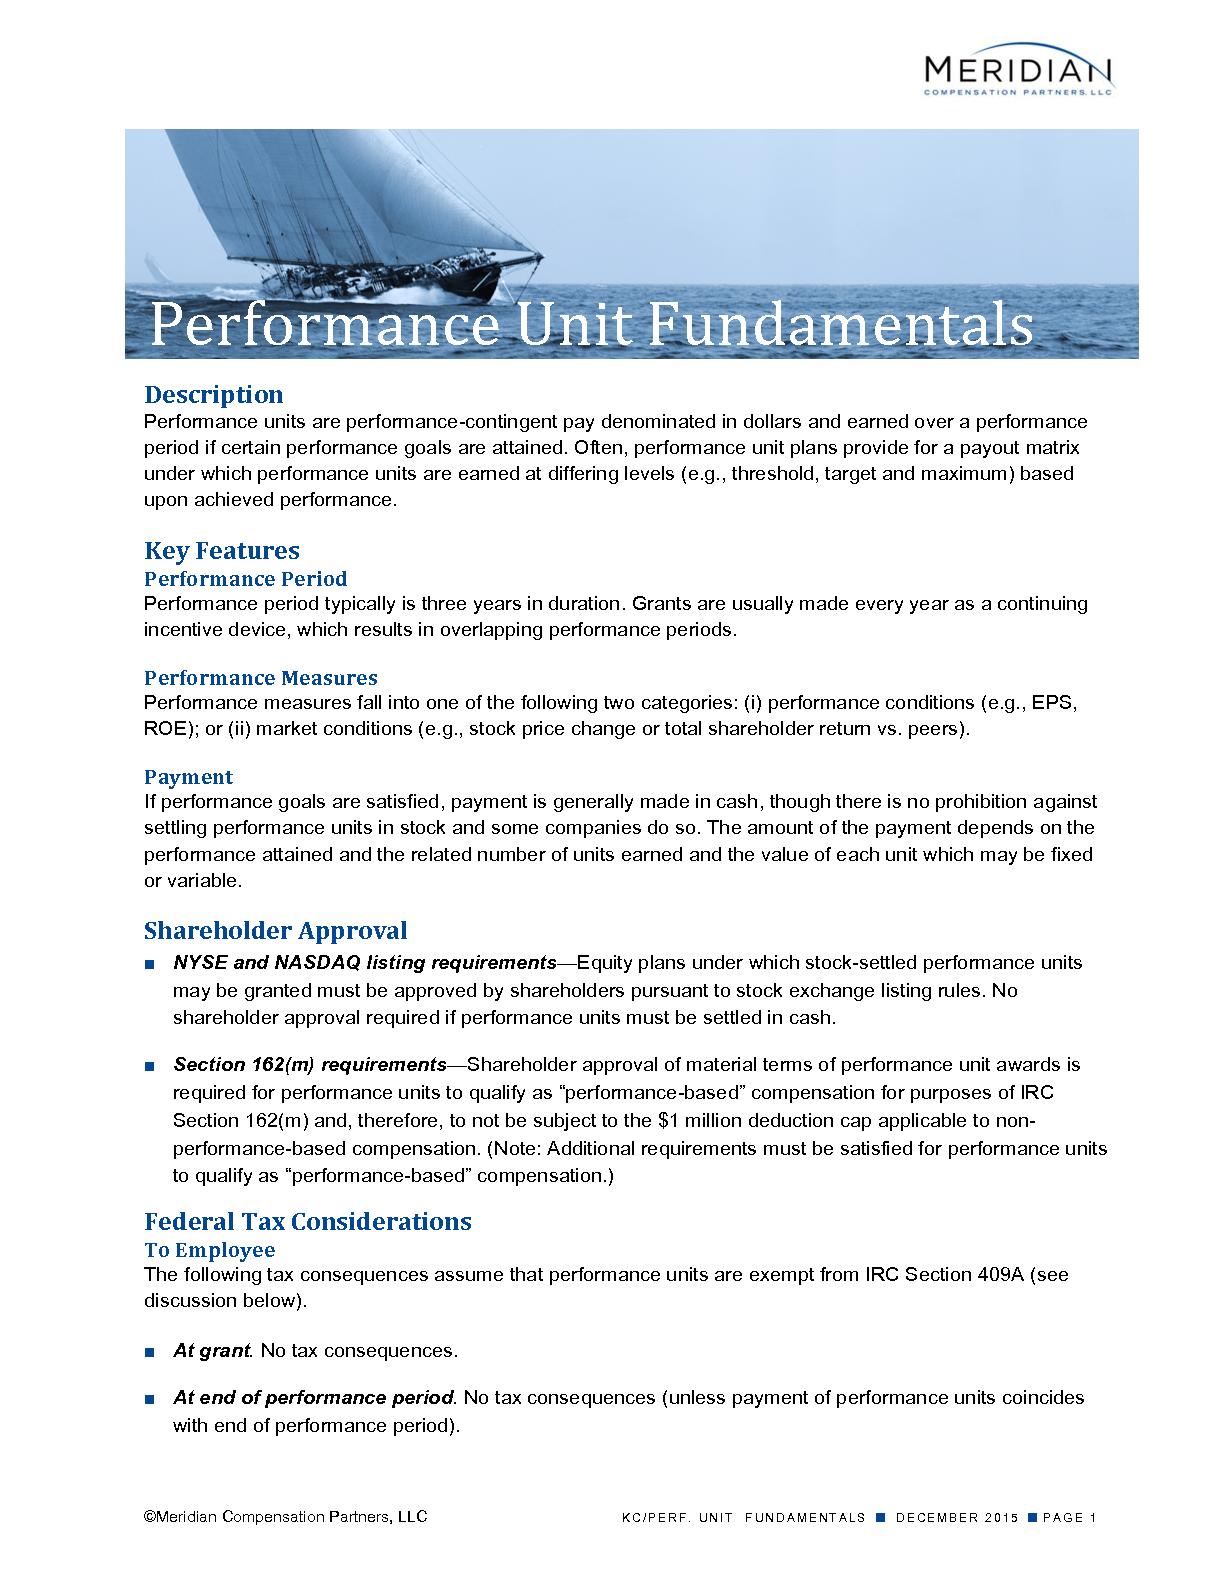 Performance Unit Fundamentals (PDF)